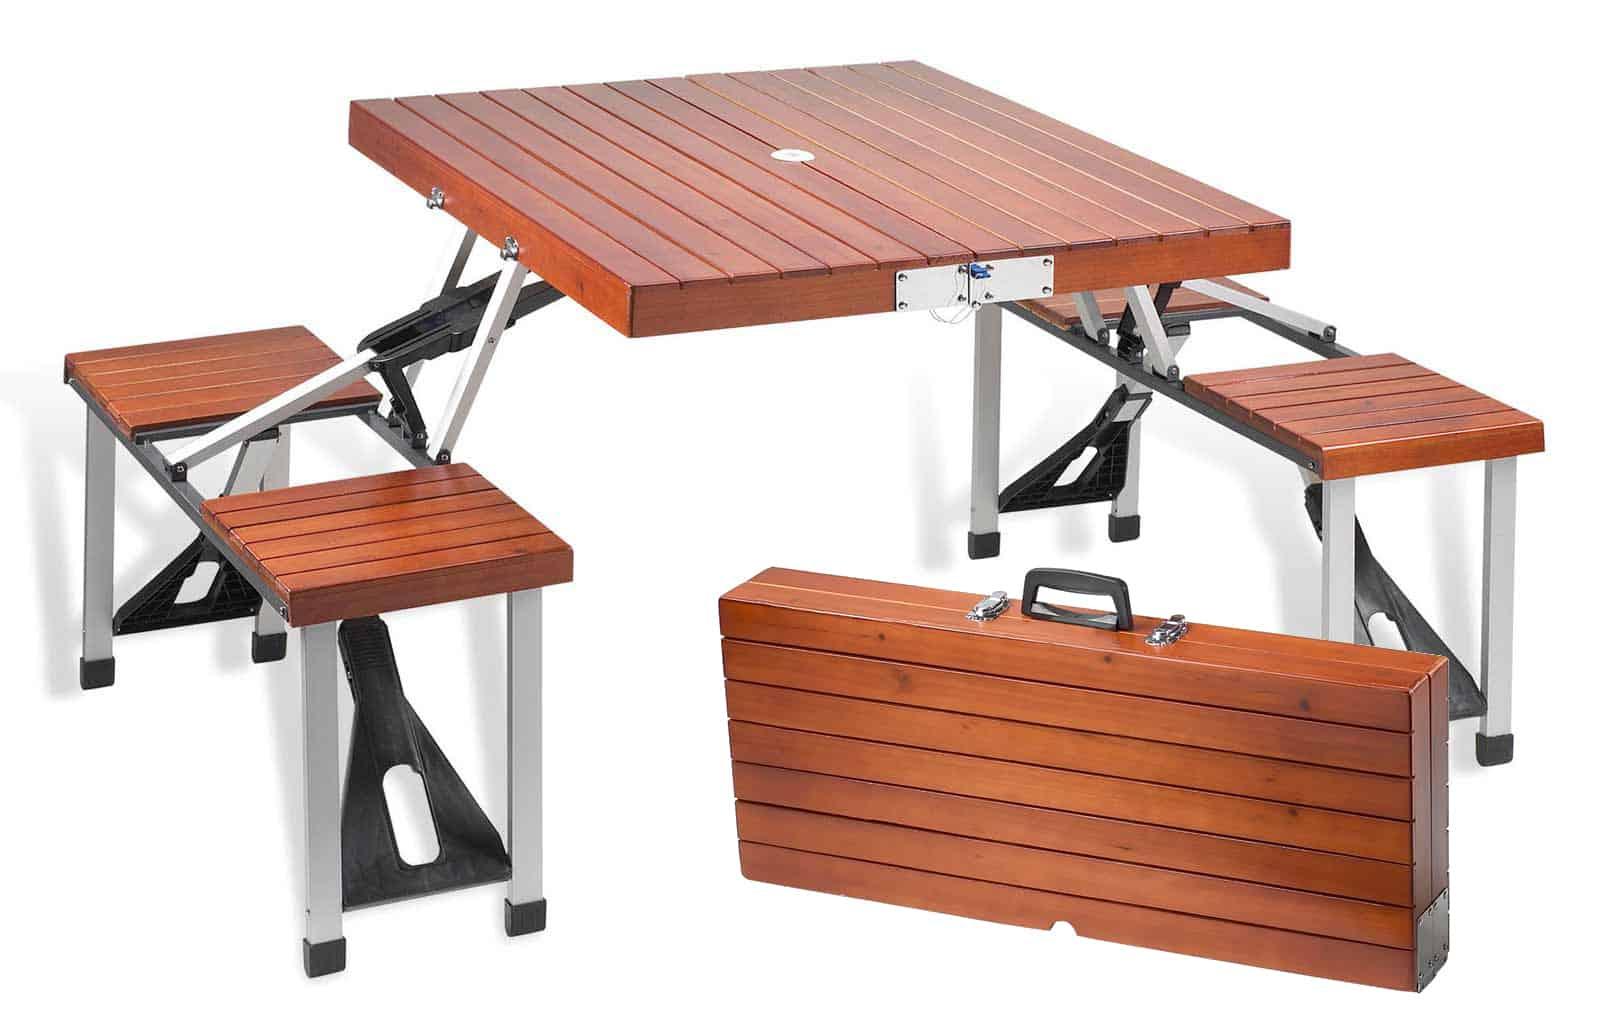 Tailgate Folding Wooden Picnic Table NoveltyStreet : Tailgate Folding Wooden Picnic Table Unique Product from noveltystreet.com size 1600 x 1014 jpeg 394kB